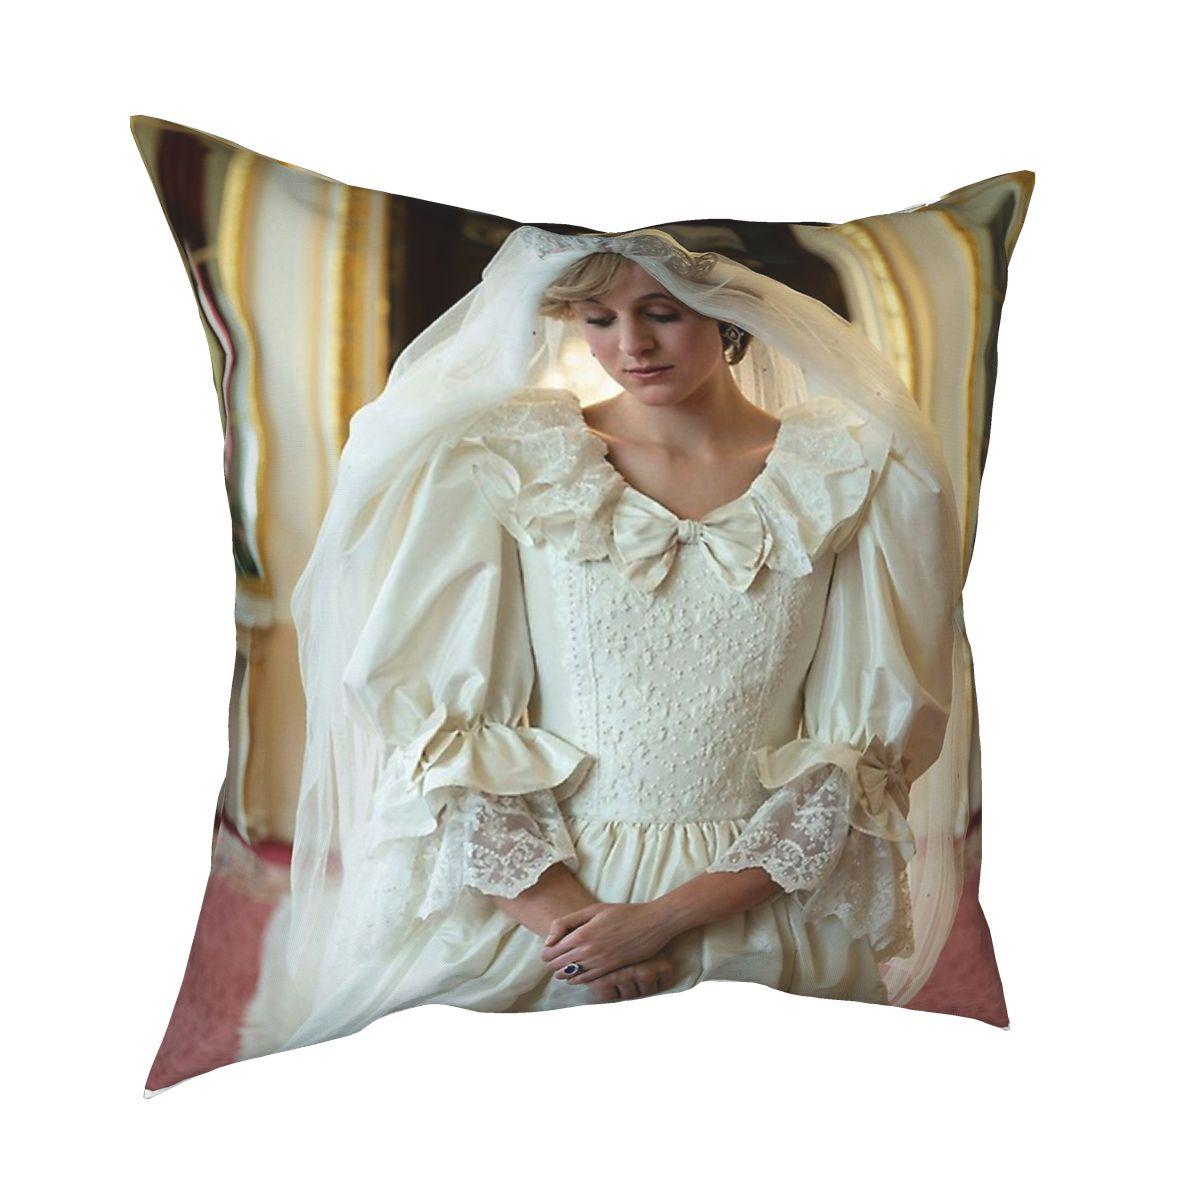 Emma Corrin As Princess Diana Spencer Cushions for Sofa Vintage Cushion Covers Decorative Throw Pillows Cover for sofa home